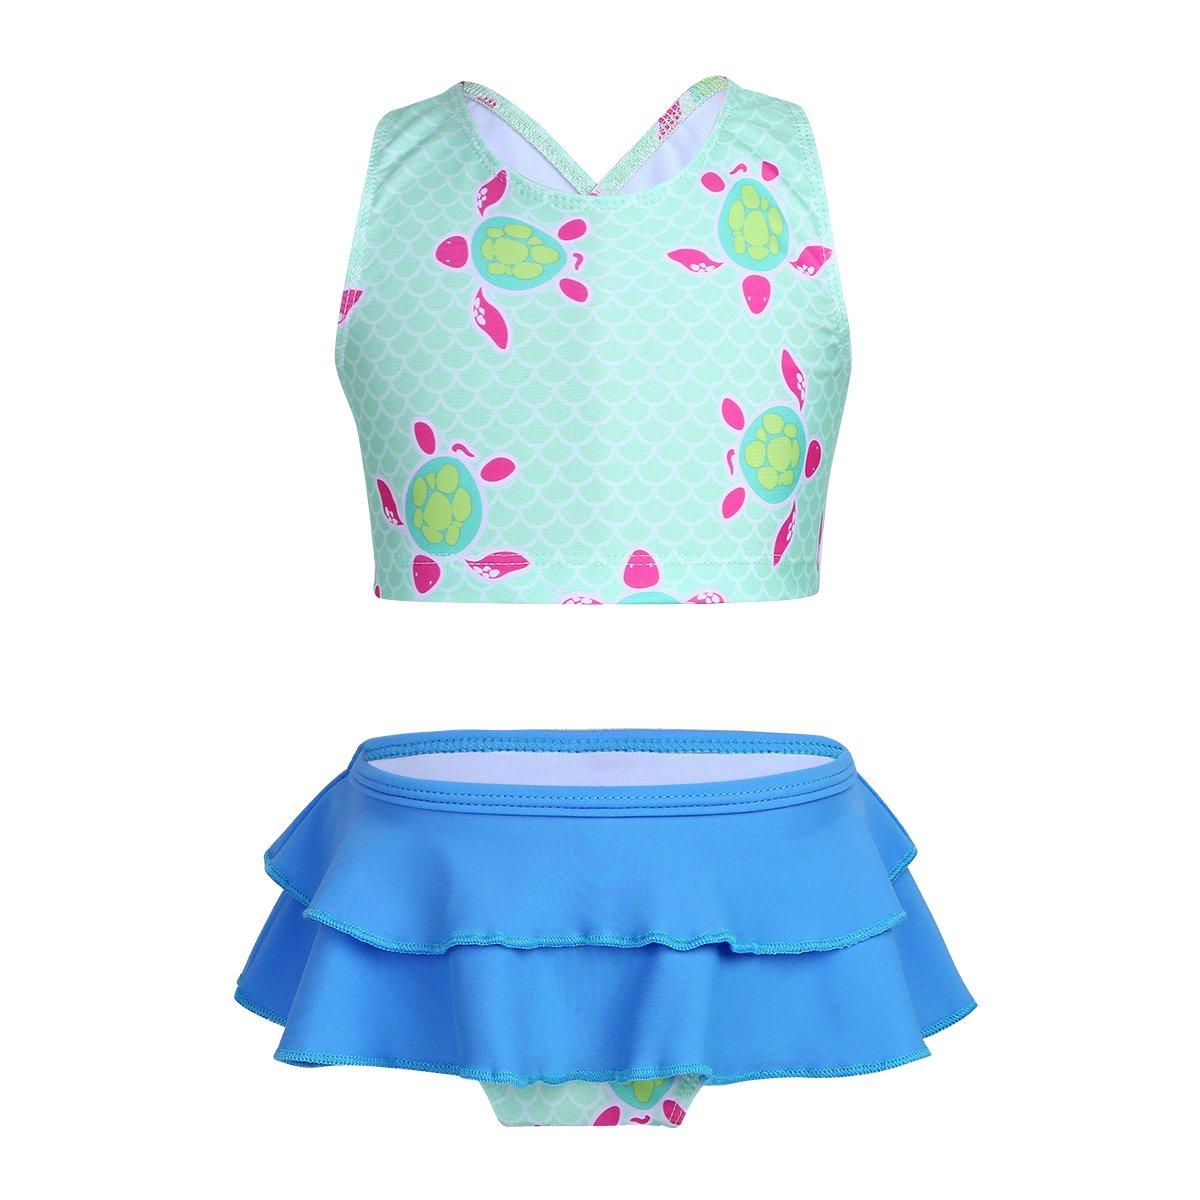 iiniim Big Girls Two Piece Spaghetti Swimwear Swimsuit Tankini Sets Kids Floral Bathing Suit